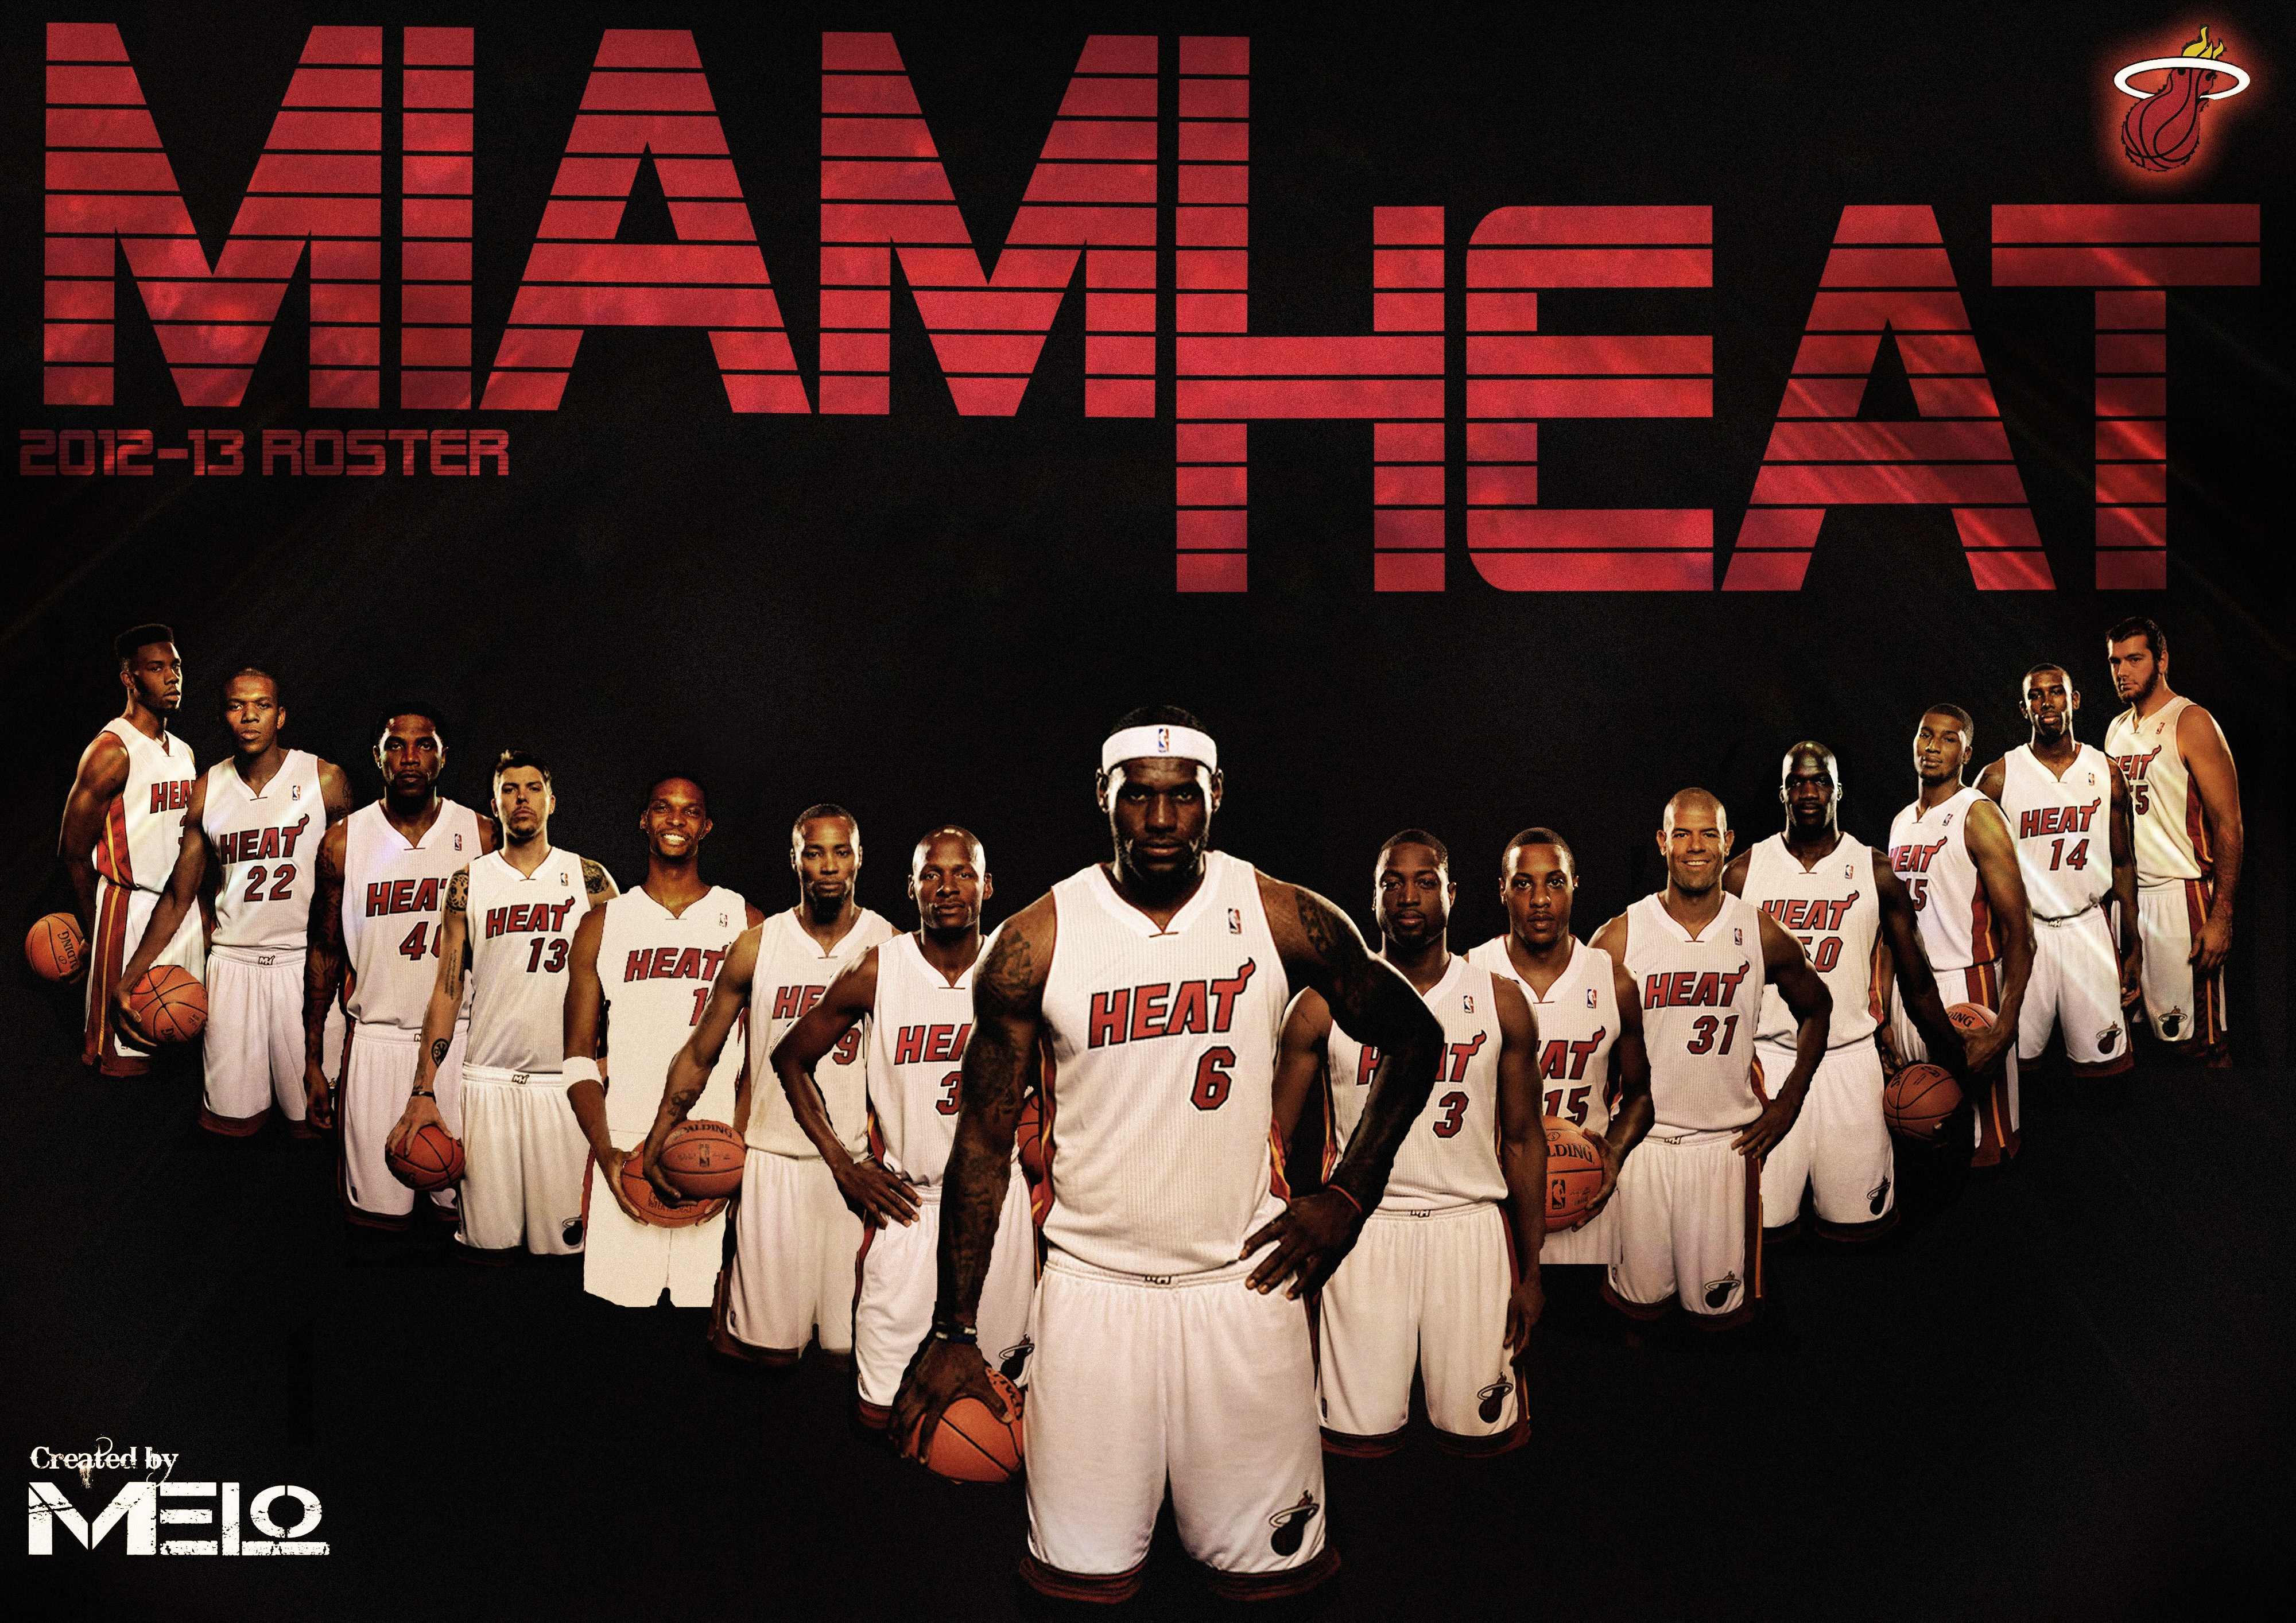 Miami Heat   Wallpapers Pictures Images Pics Photos Desktop 4000x2828